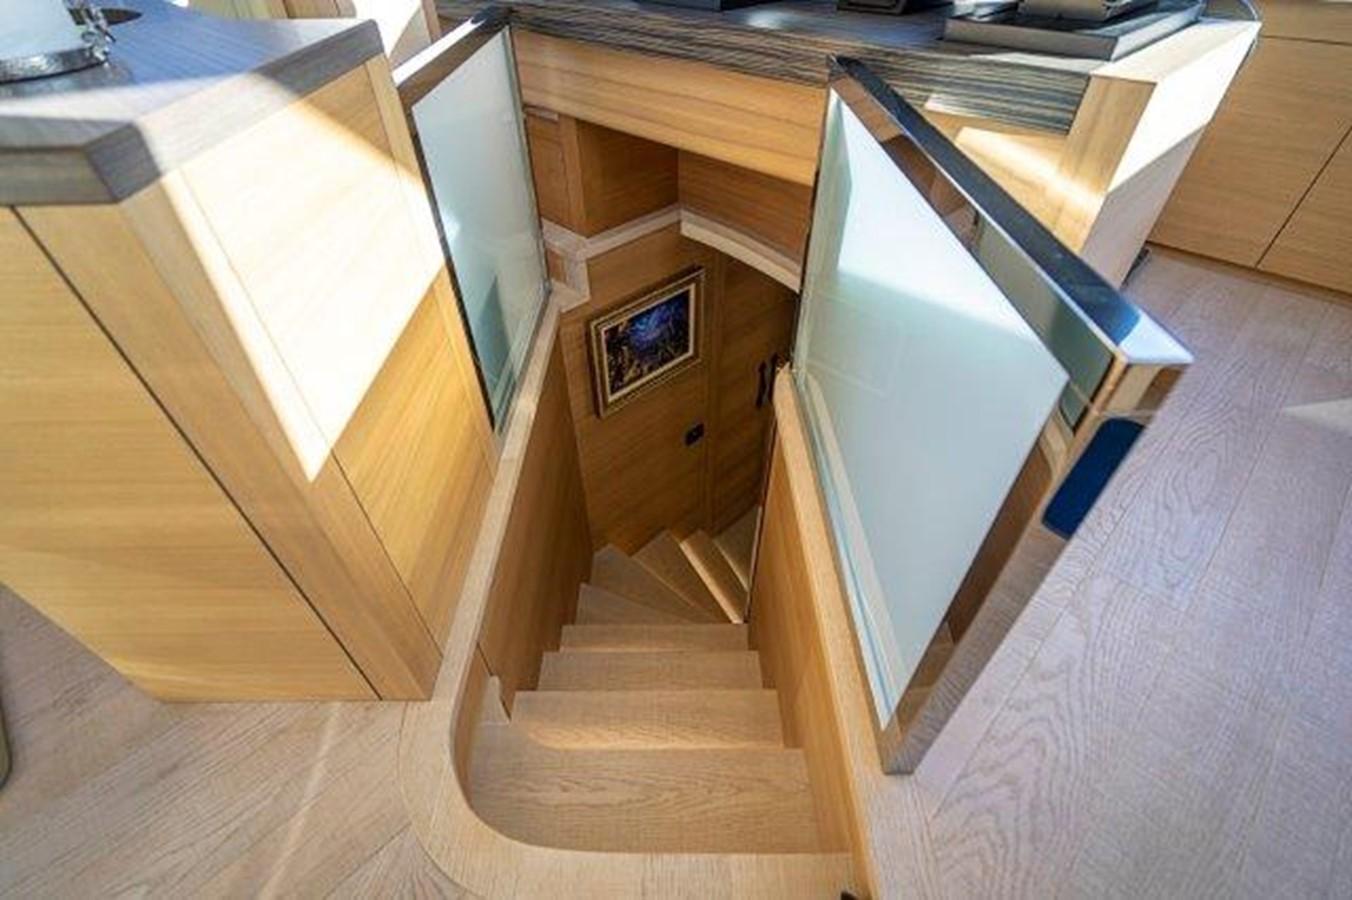 Stairs to Companionway 2014 PERSHING  Motor Yacht 2431288